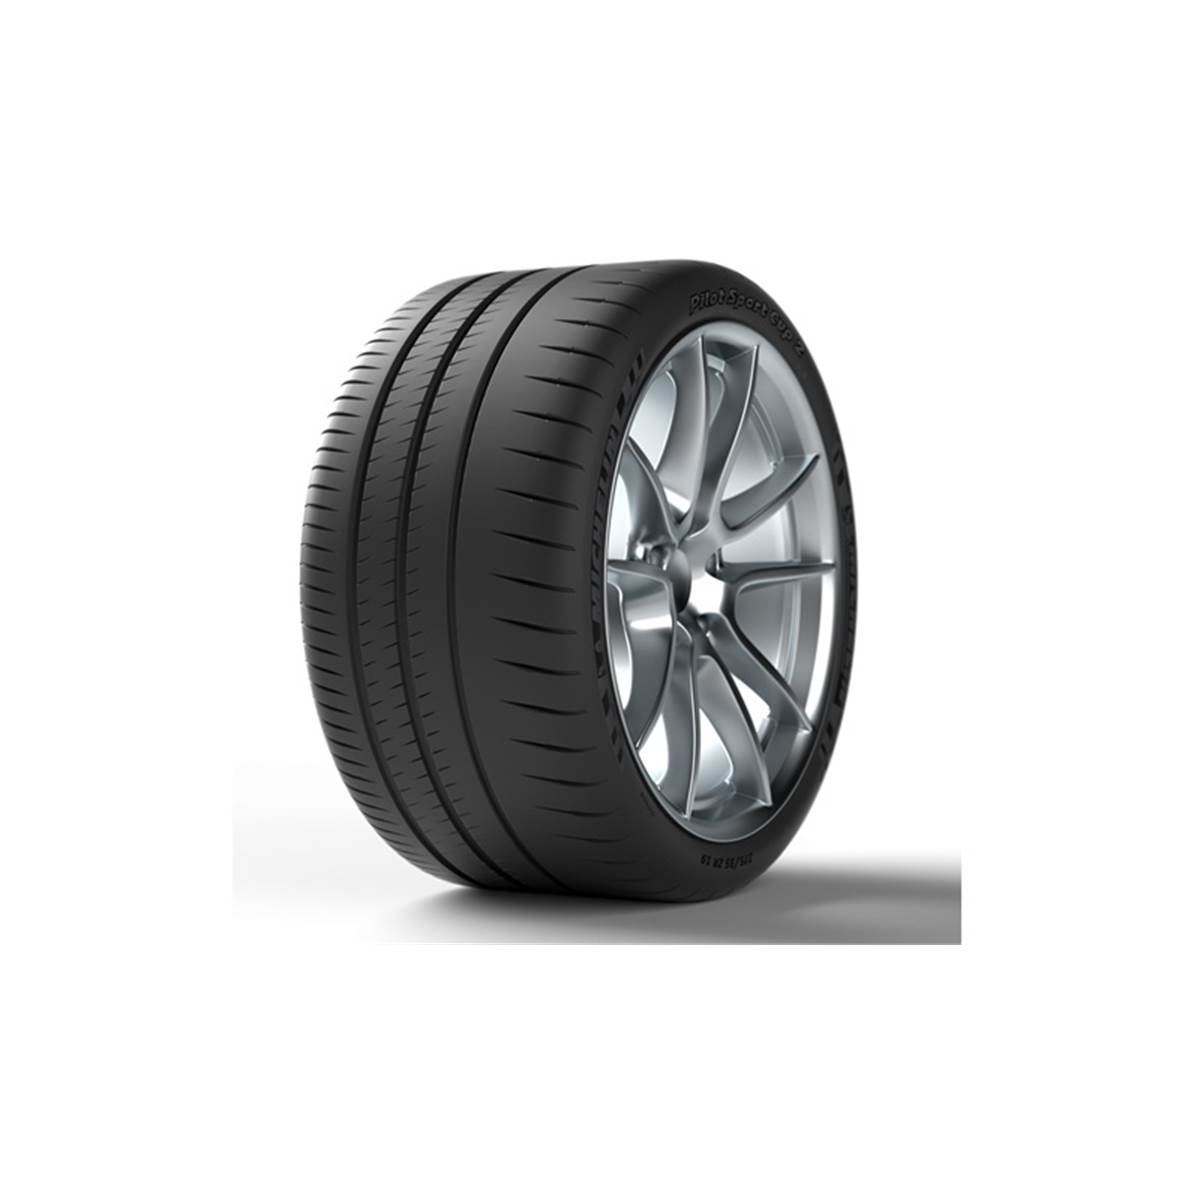 Pneu Michelin 285/35R20 104Y Pilot Sport Cup 2 XL